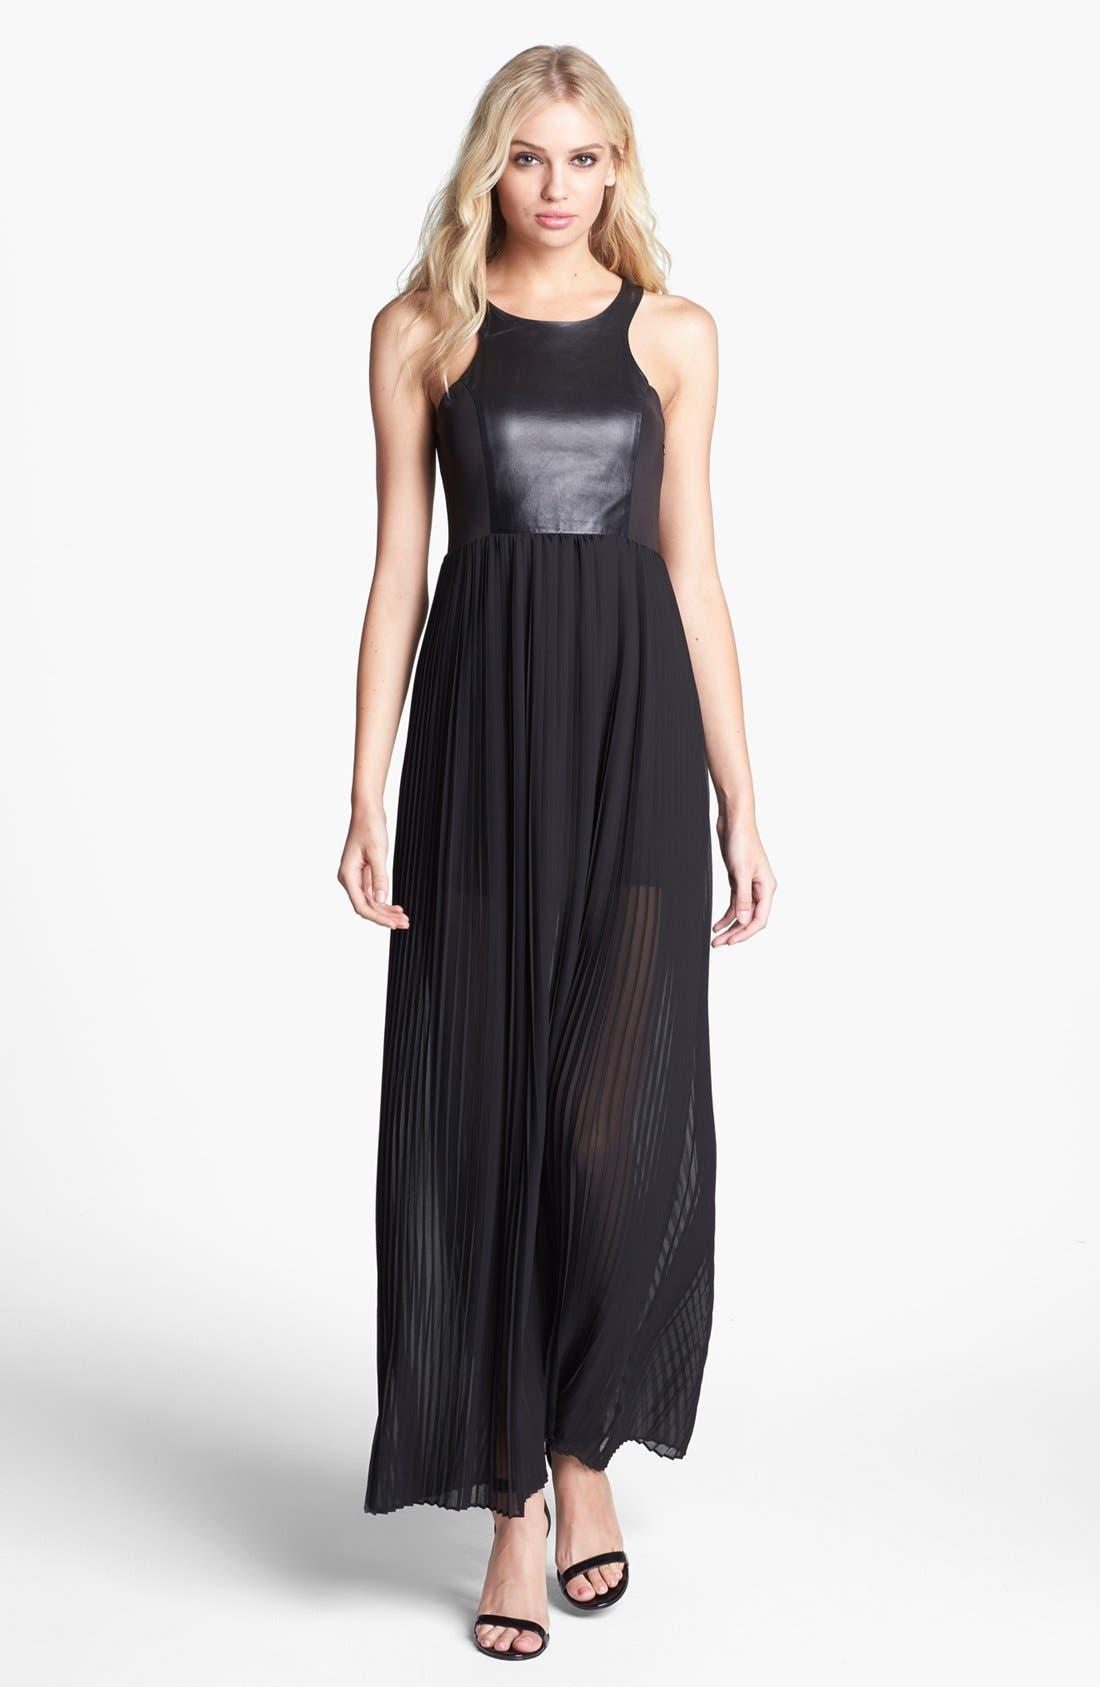 Alternate Image 1 Selected - BLAQUE LABEL Faux Leather & Pleat Chiffon Maxi Dress